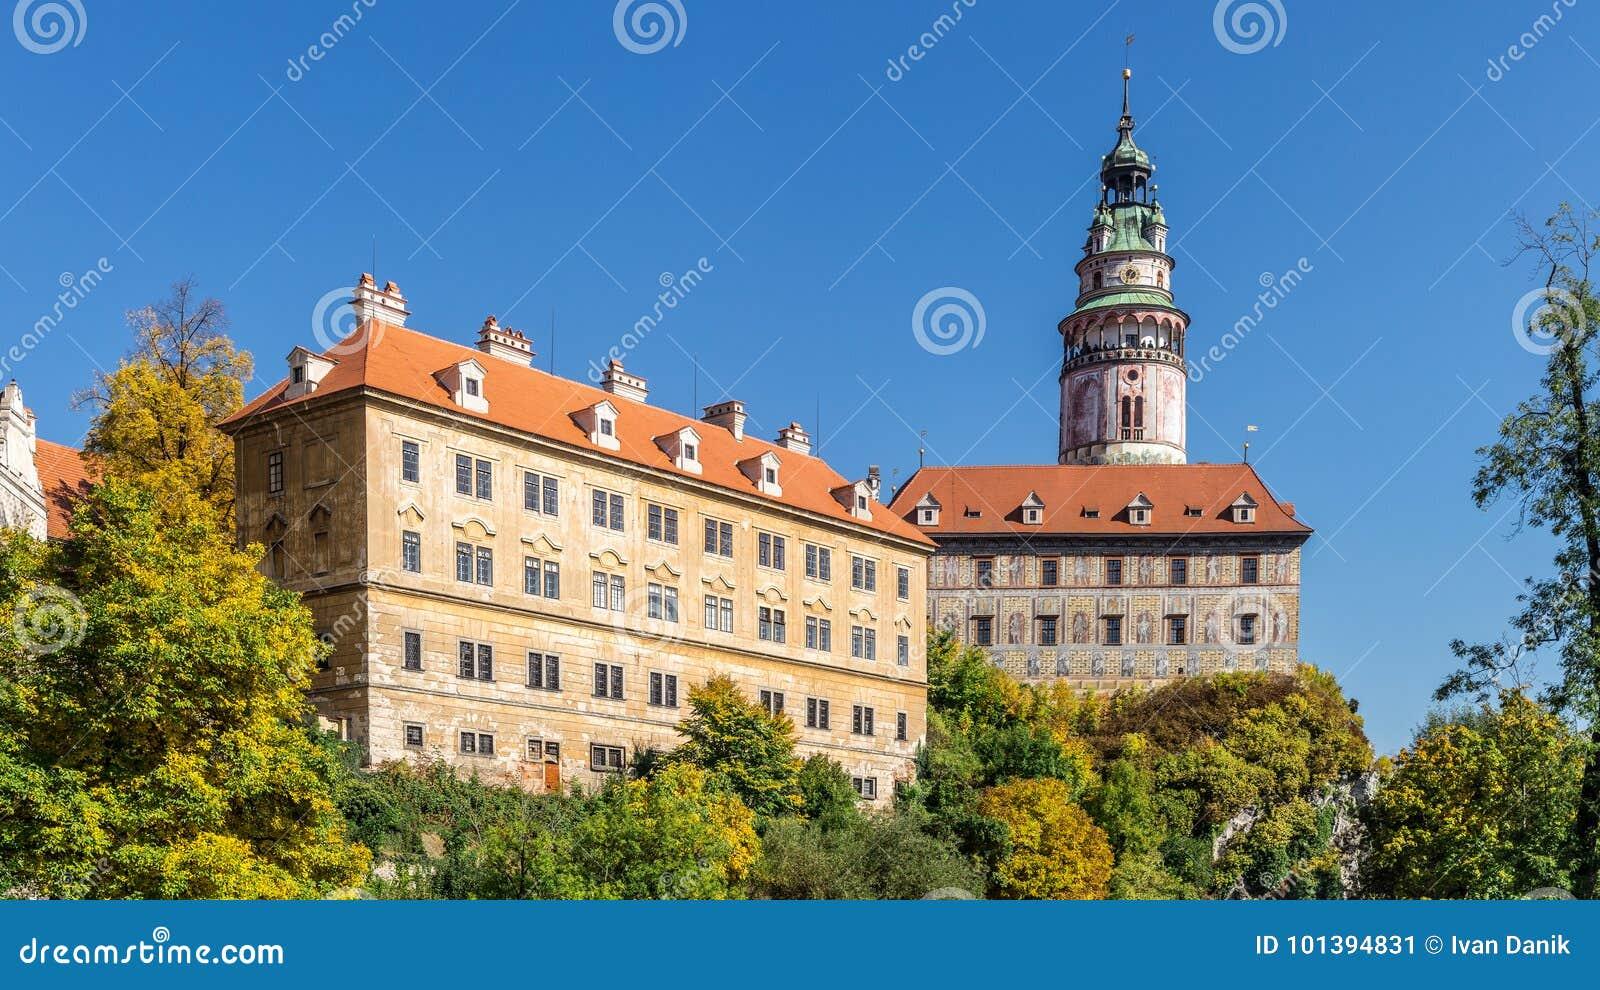 Castle of Cesky Krumlov in South Bohemia